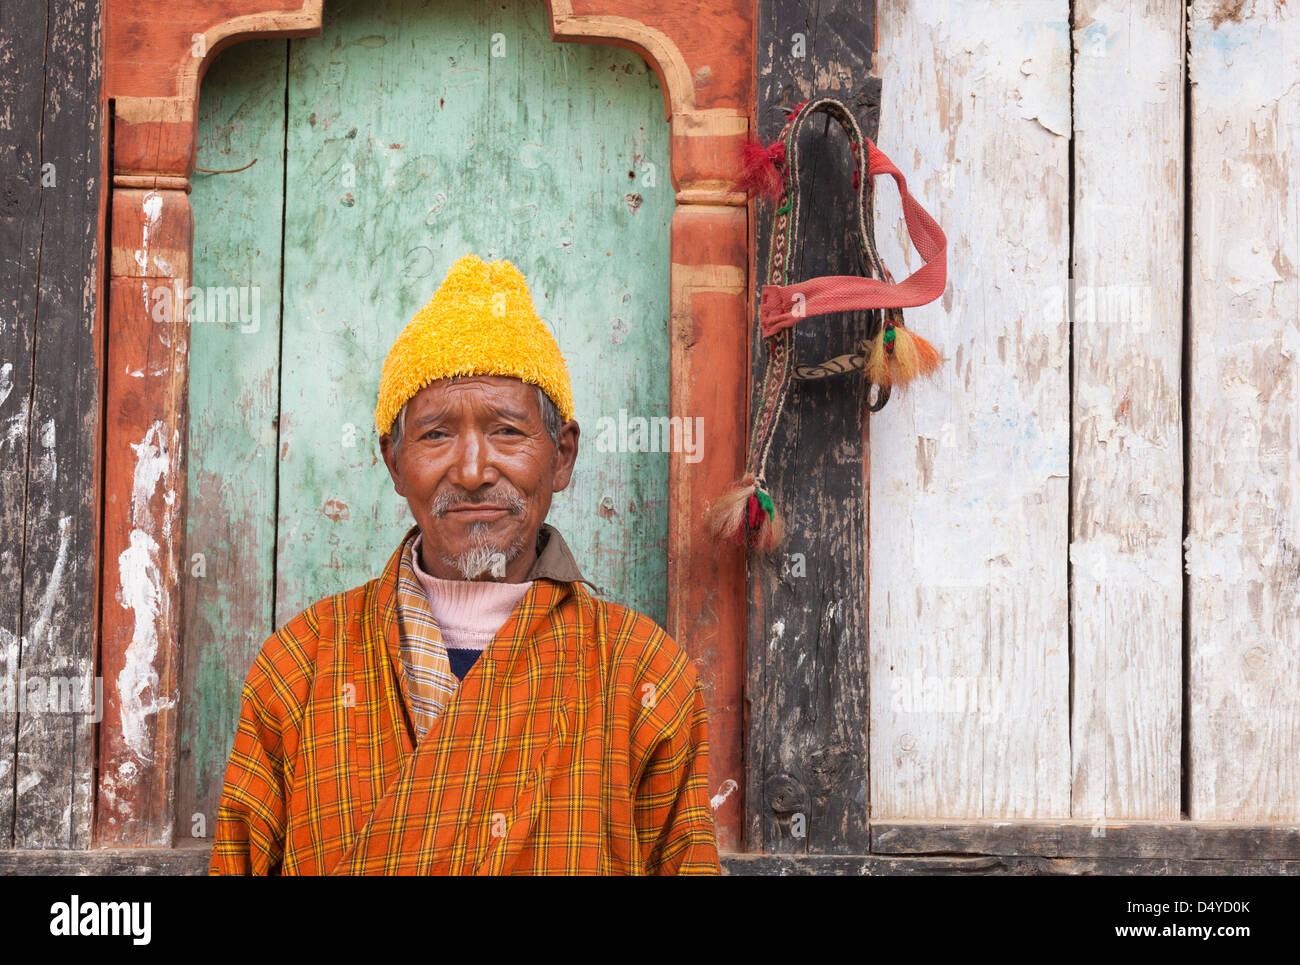 Portrait, Bhutan - Stock Image